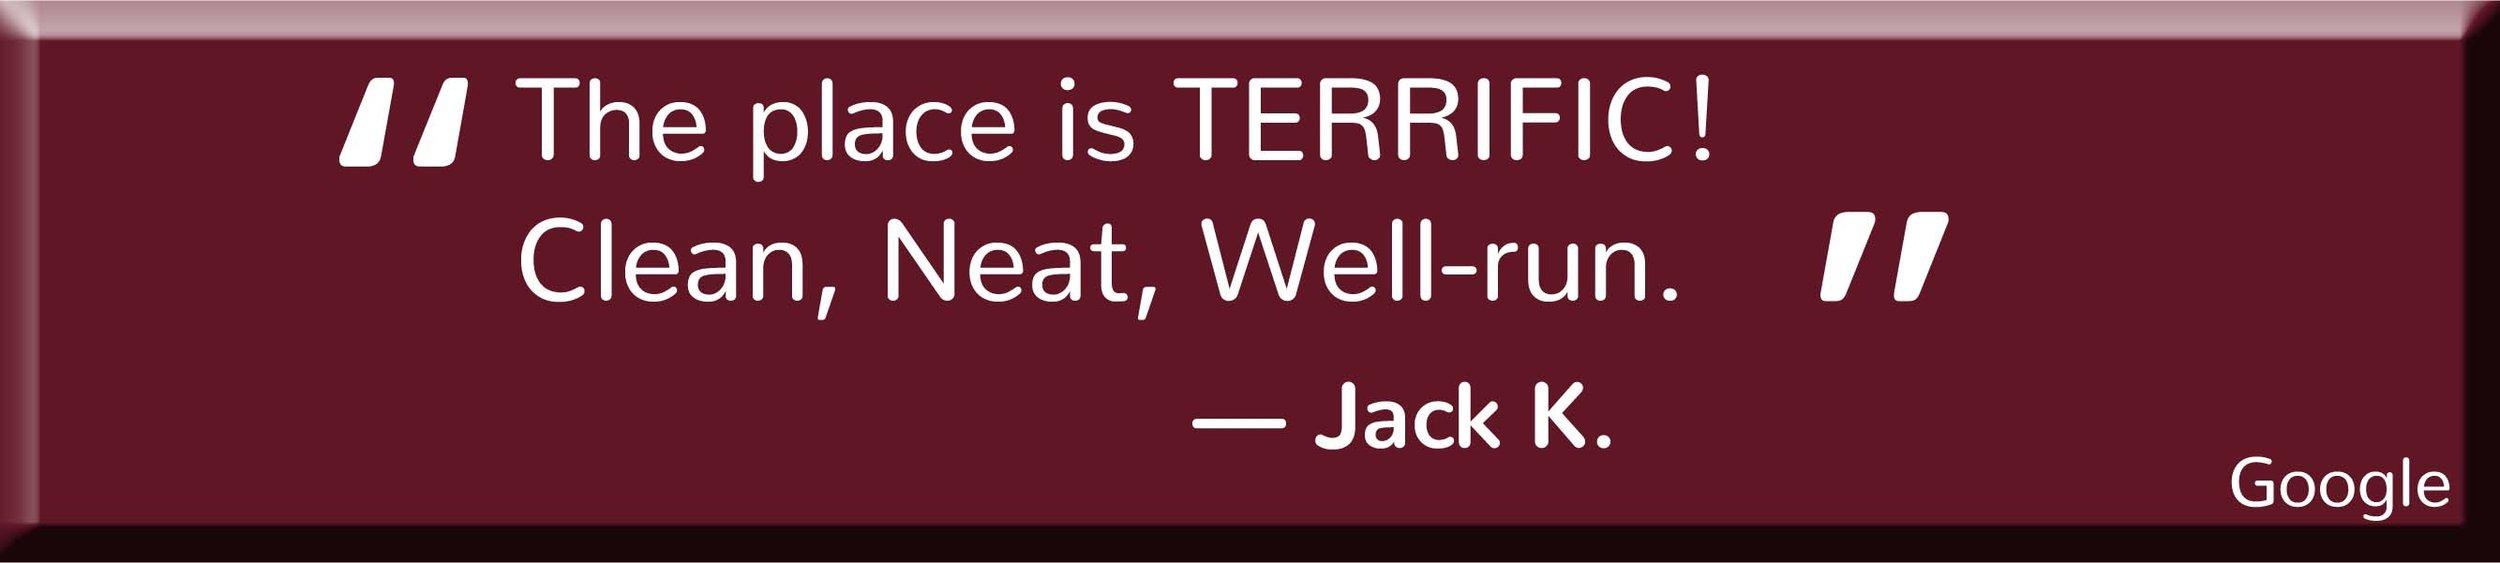 BR testimonial Jack.jpg